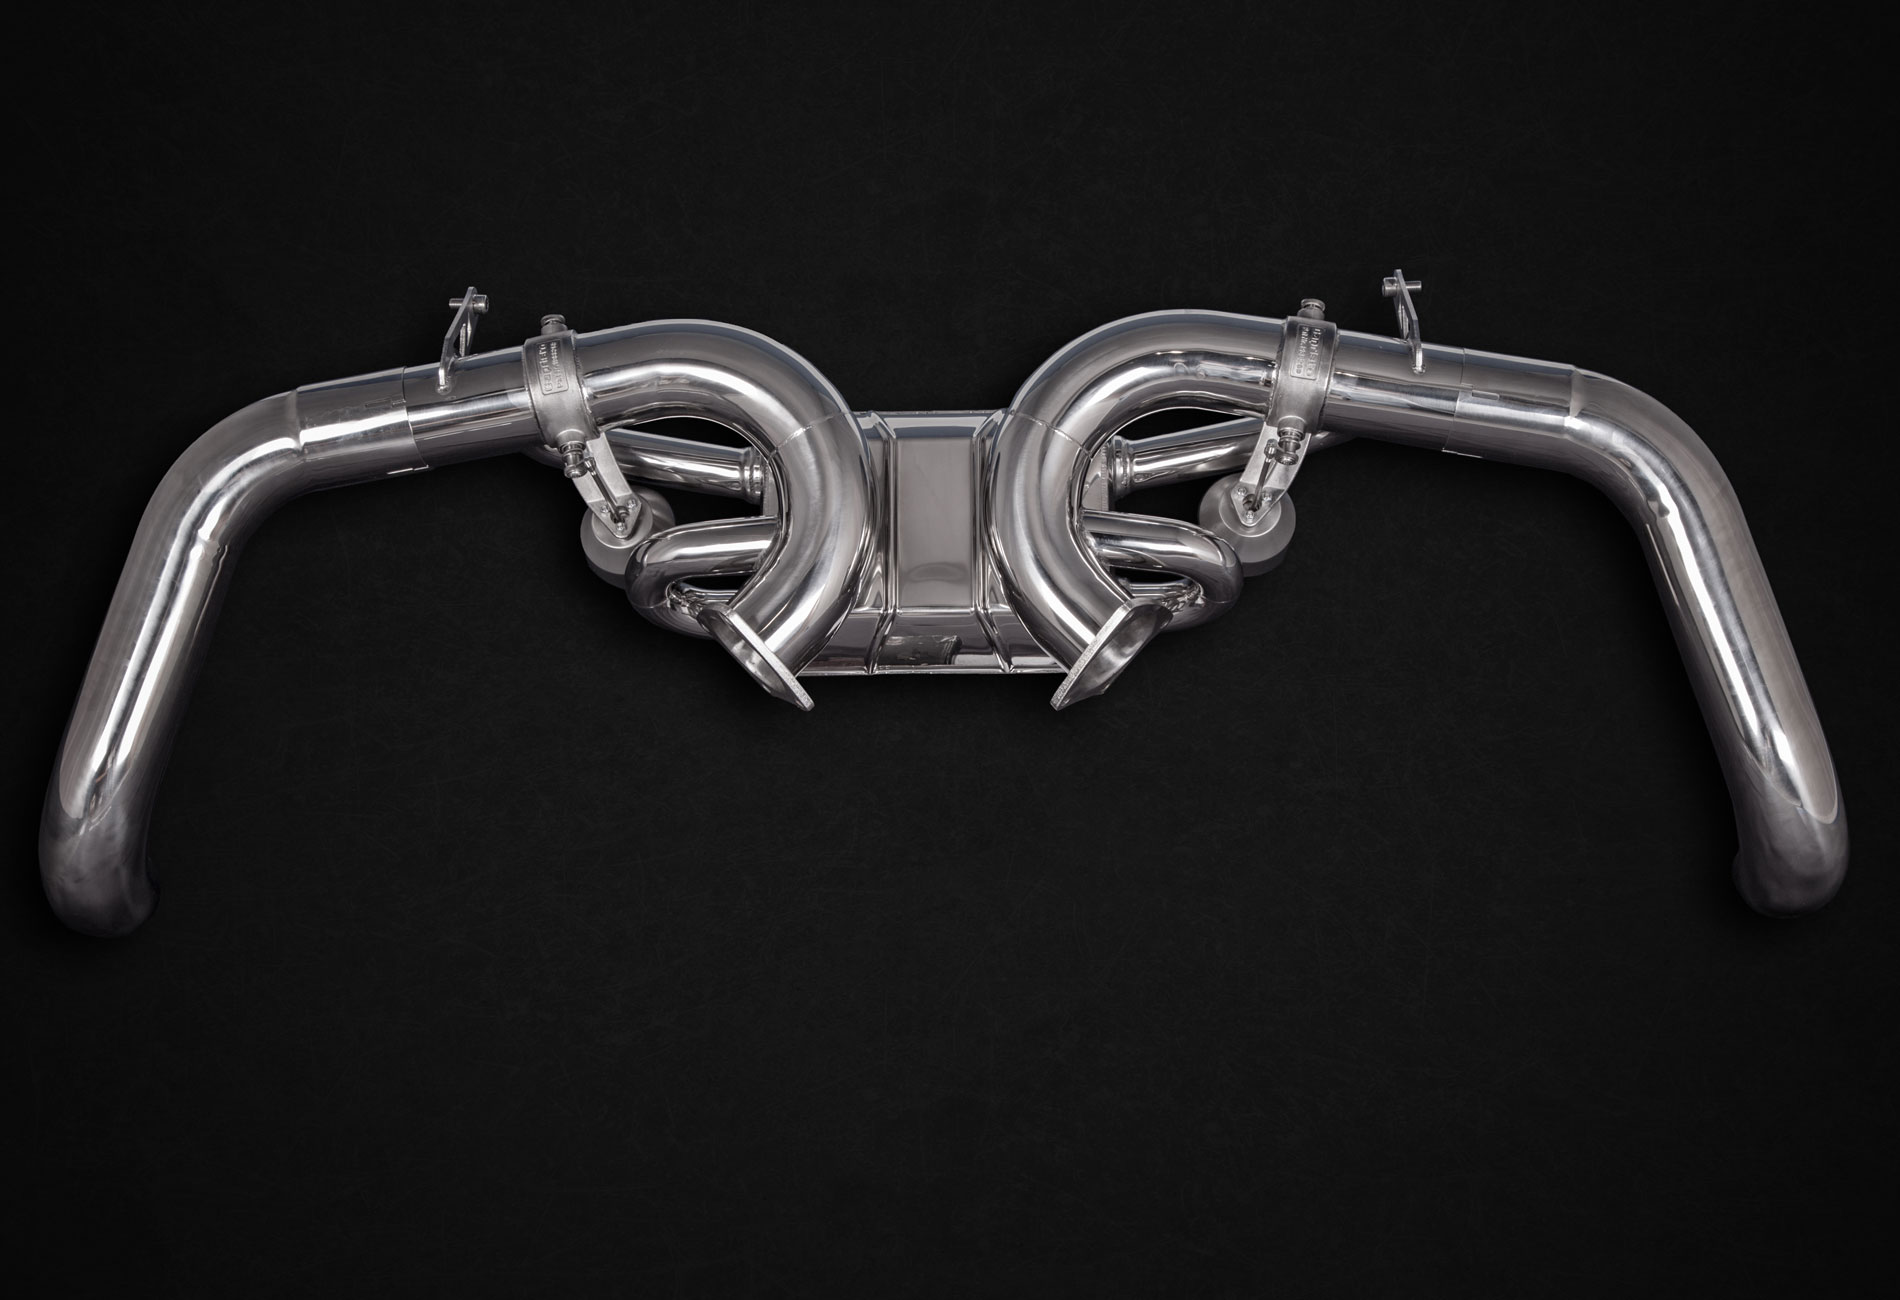 Audi-R8-Spyder-by-Wheelsandmore-9